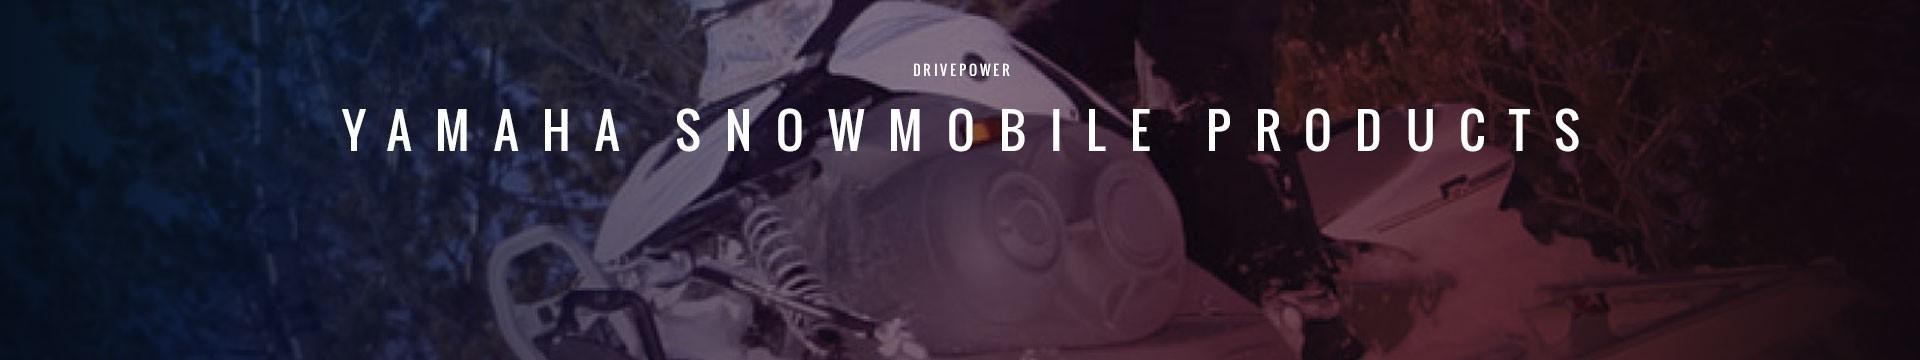 Drivepower Yamaha Snowmobile Products